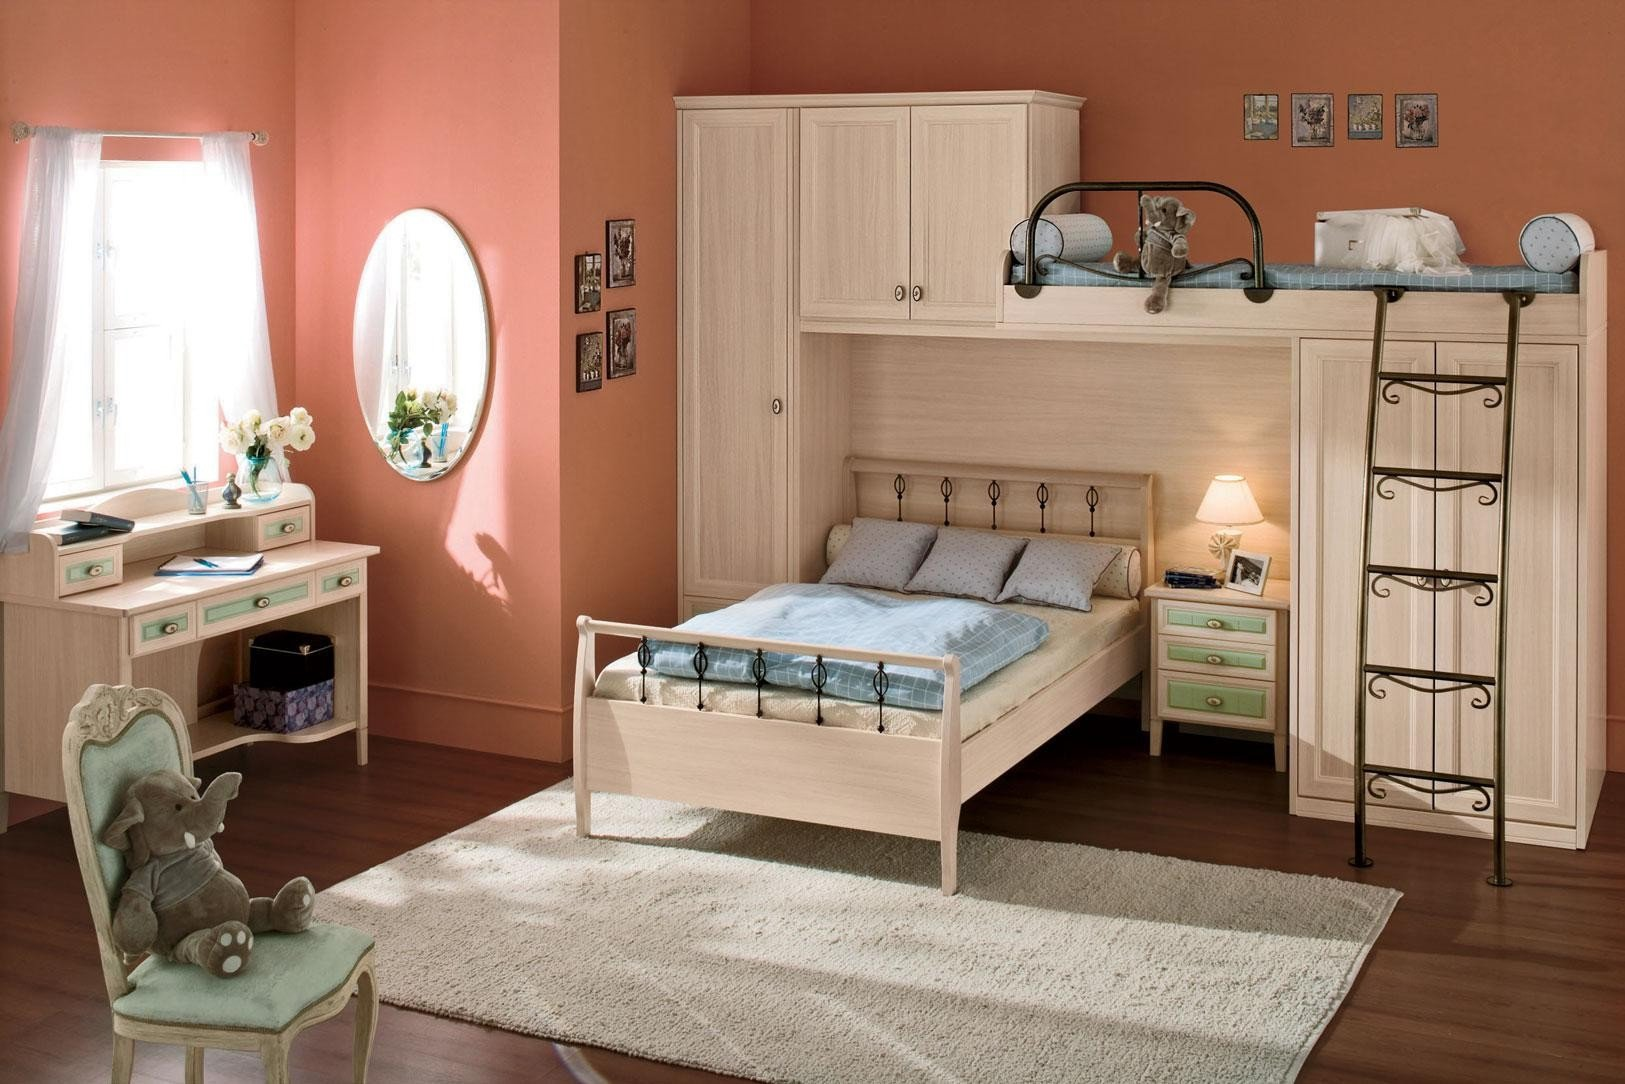 Paul Bunyan Bedroom Set Awesome ashley Furniture Kid Bedroom Sets Modern and Kids Ikea Ideas